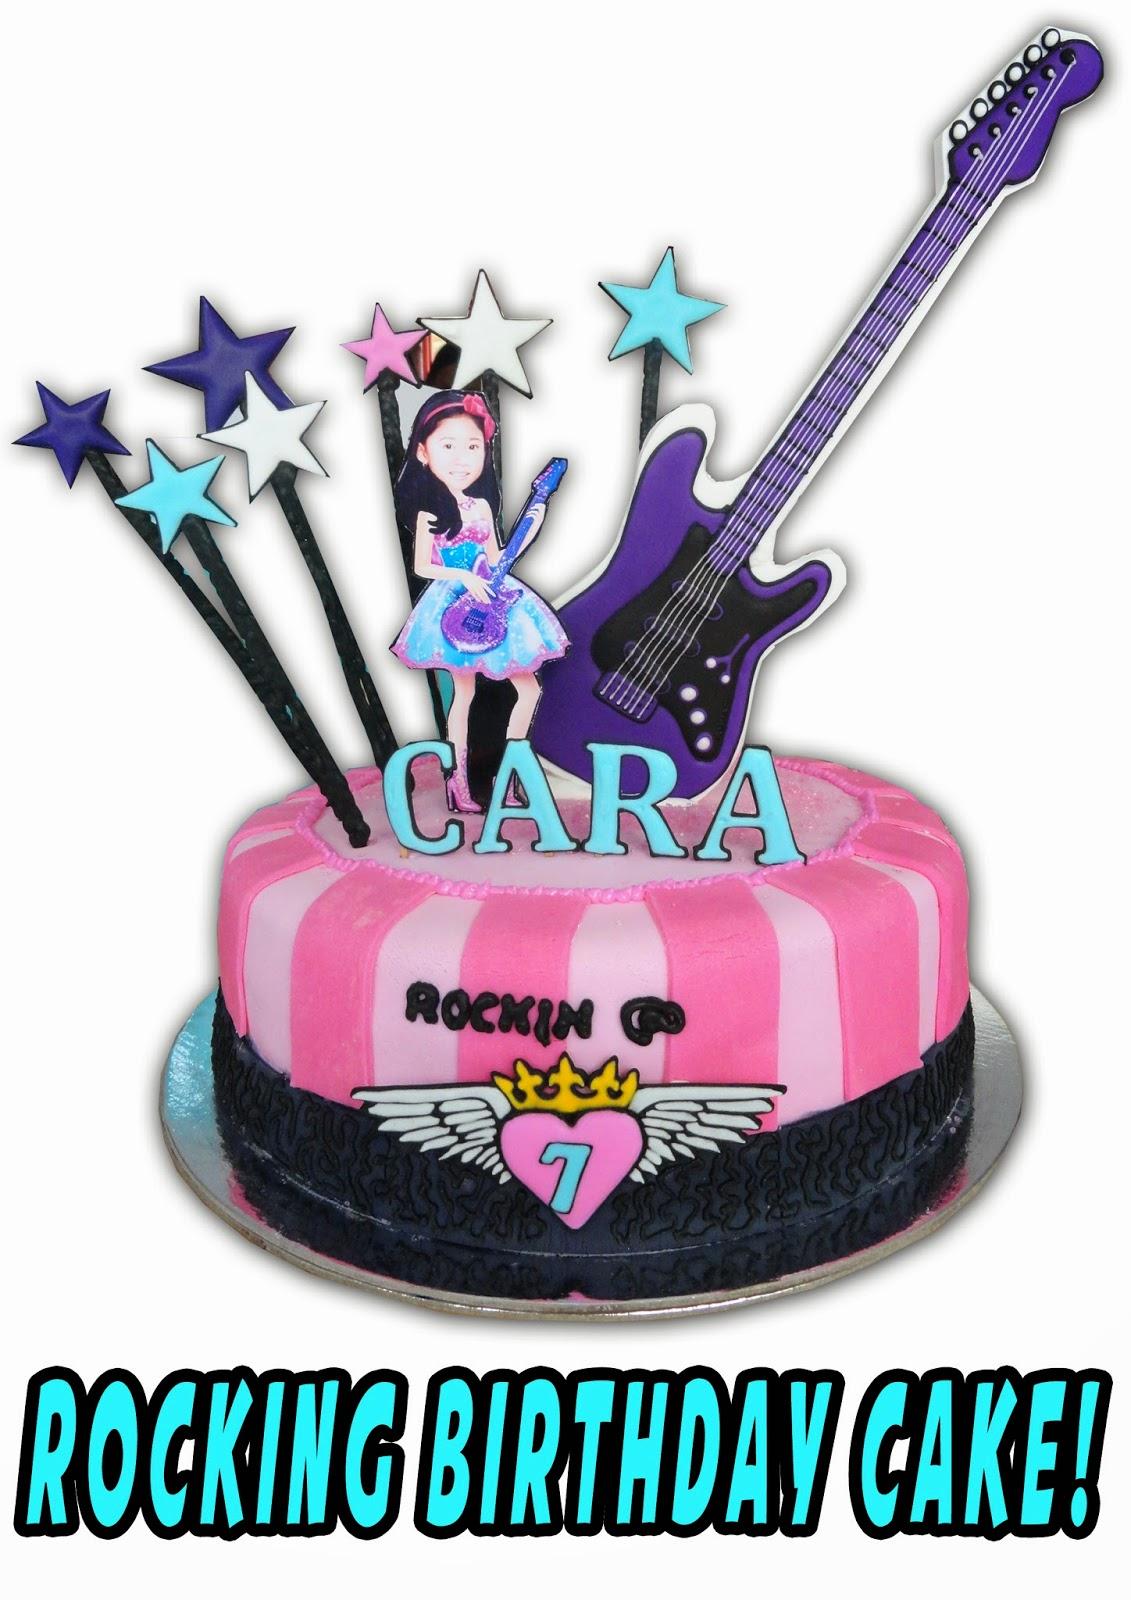 POPCAKES Rocking Birthday Cake